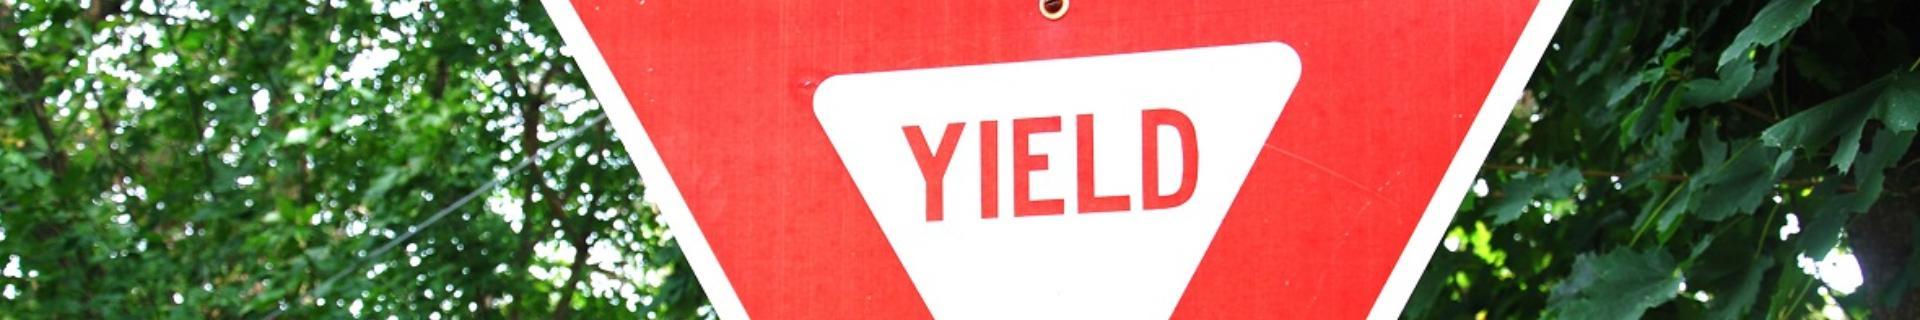 Corrective Action Training: Yielding